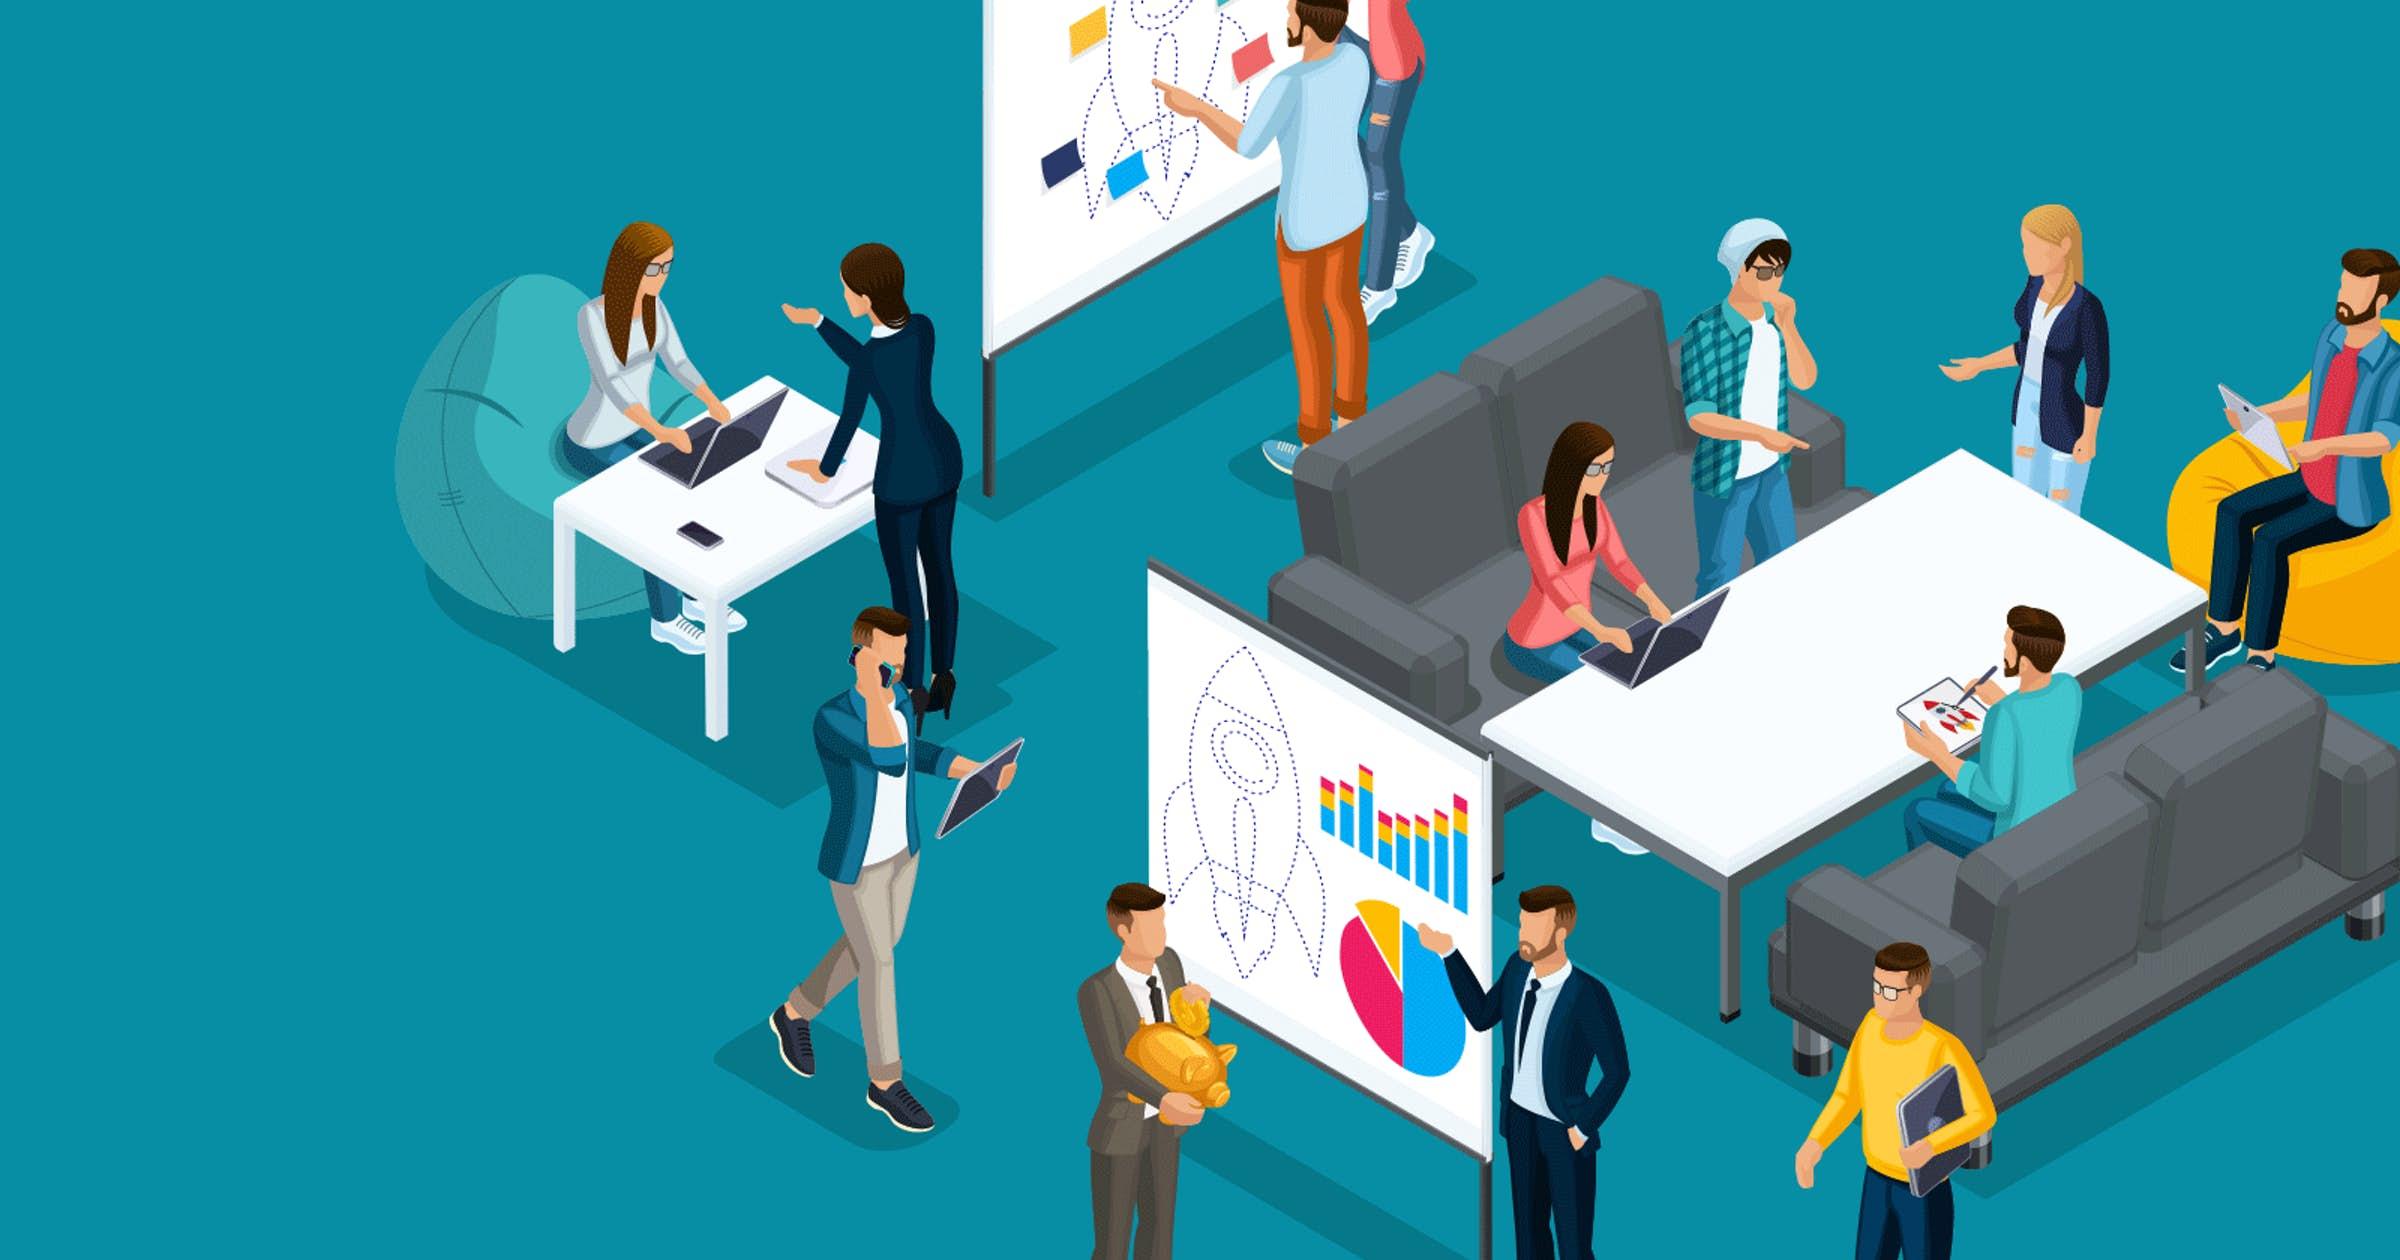 Benefits of digital transformation for several organizations